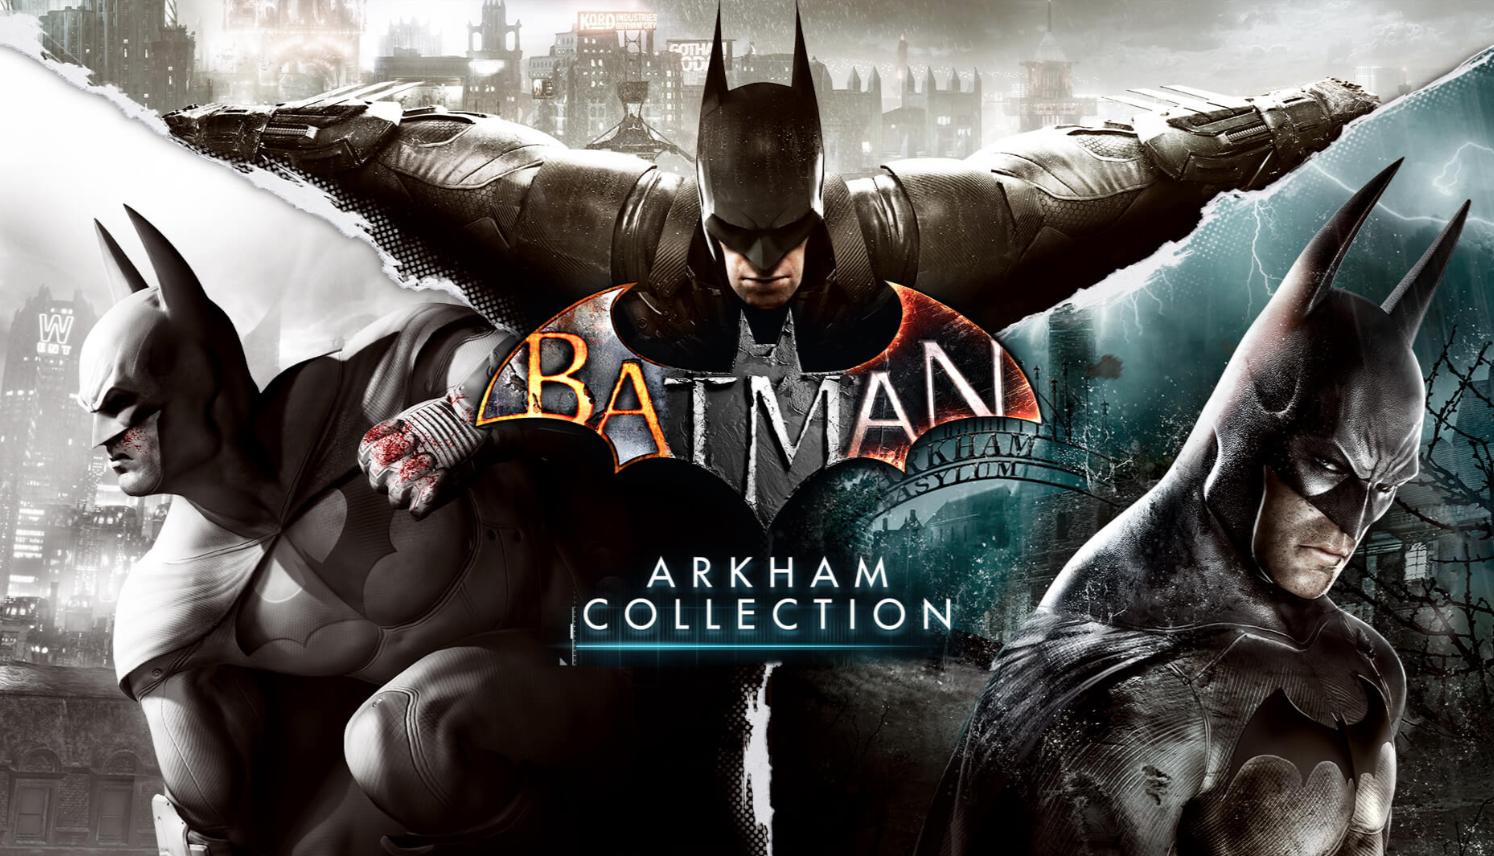 @Epicgames Batman: Arkham collection; Lego Batman Trilogy (Angebot 1 Woche gültig!)